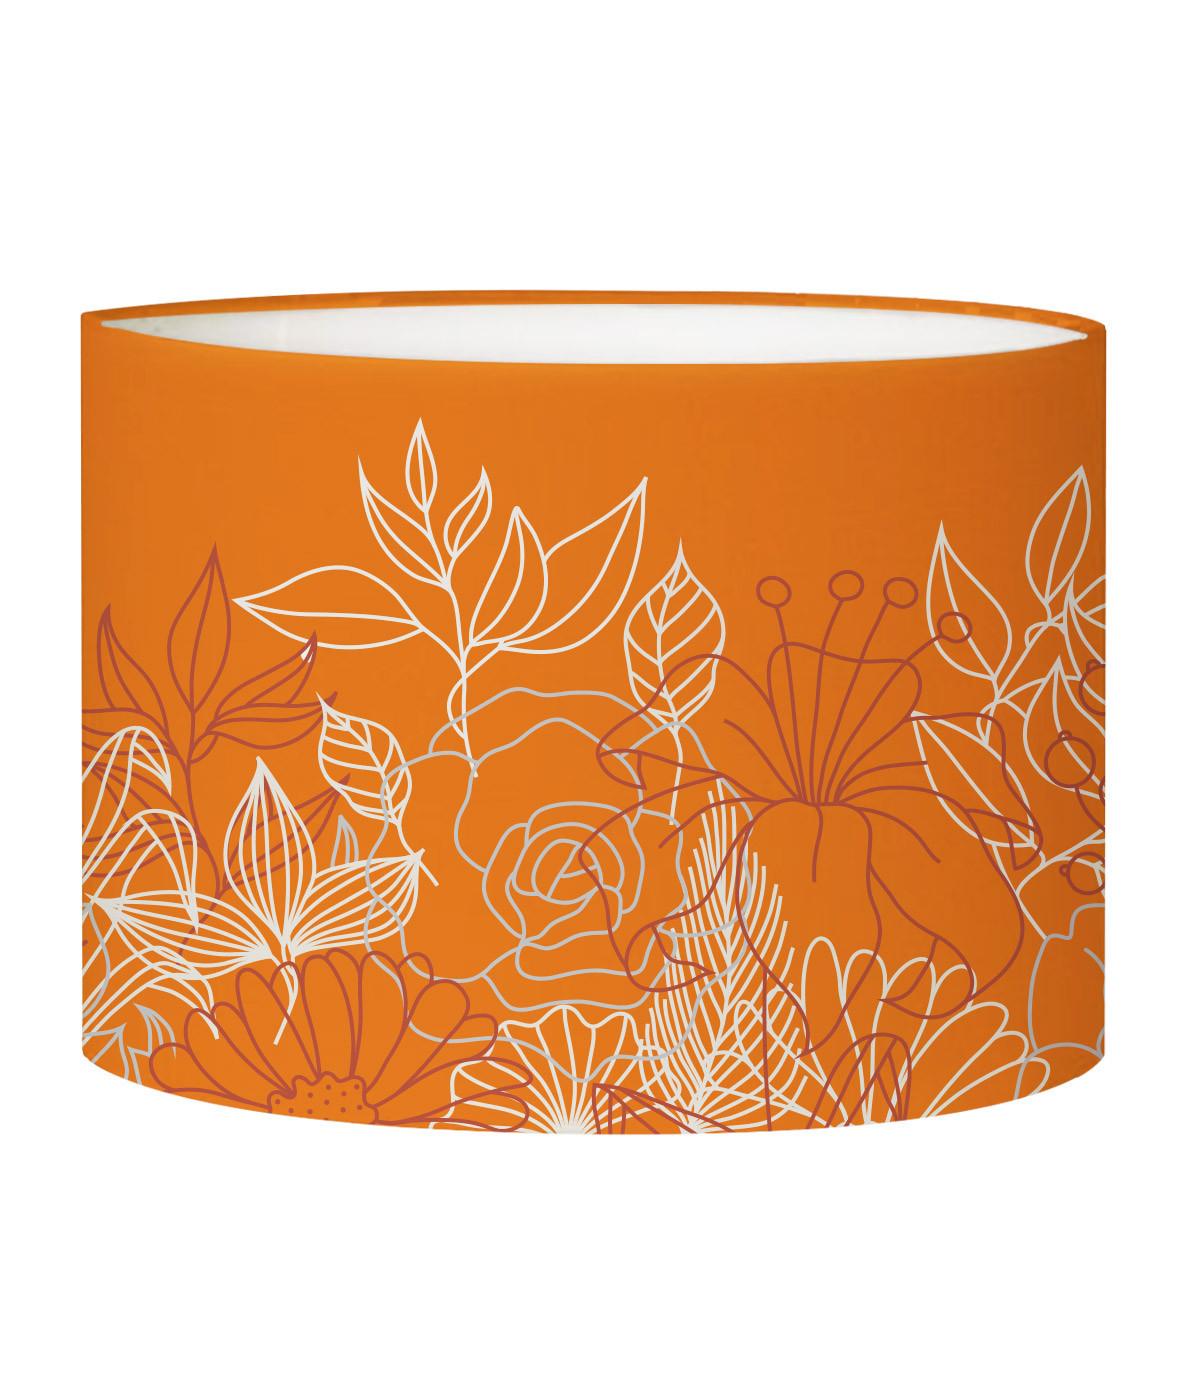 Abat-jour lampadaire mandarine d 45 cm